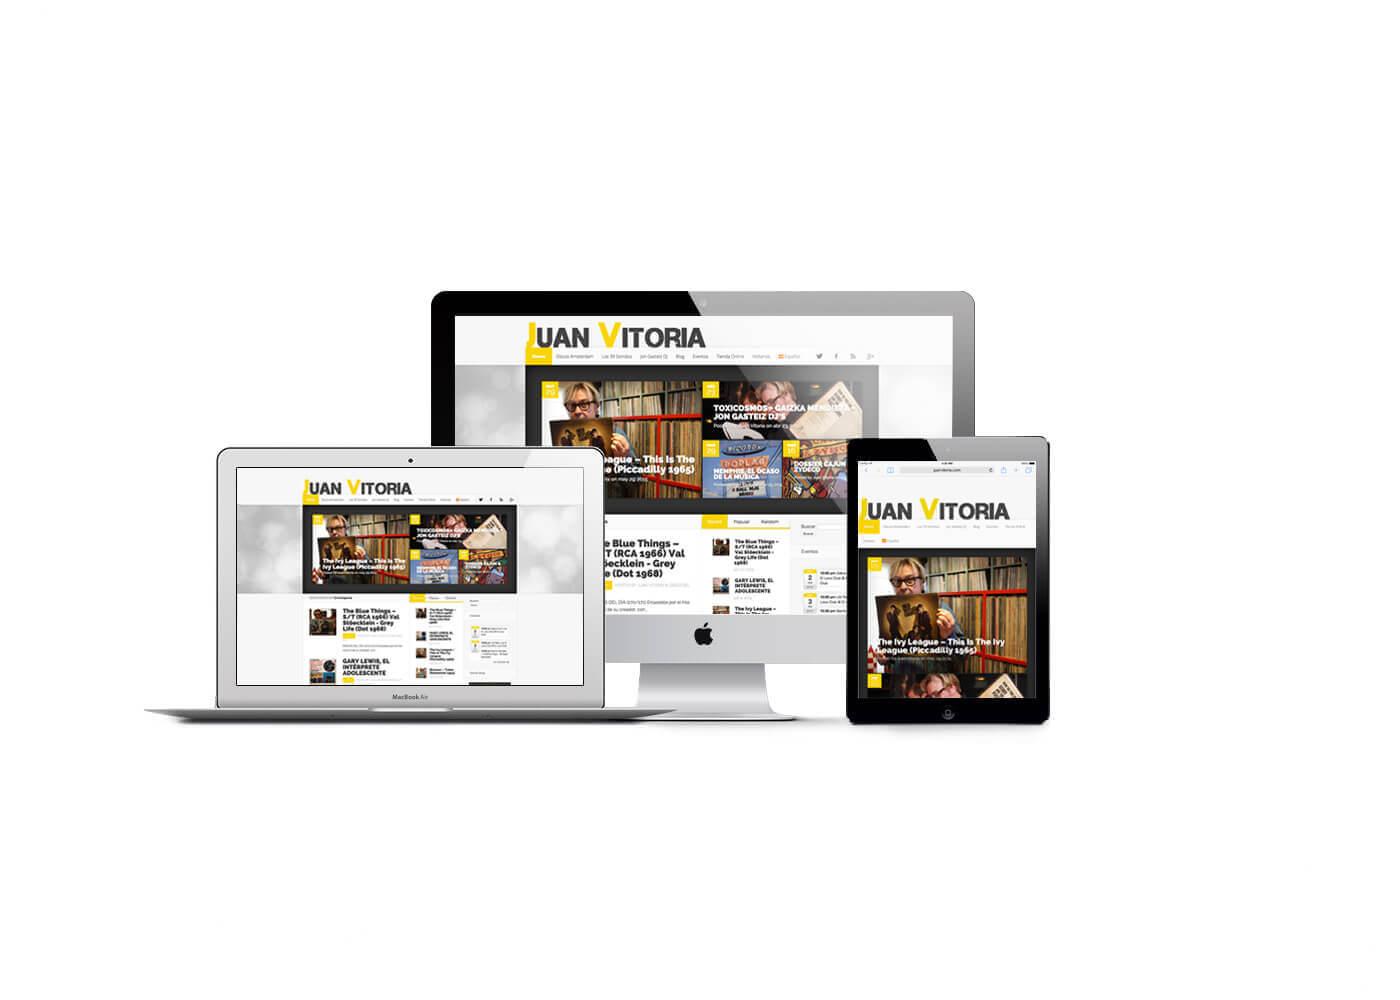 Página web Juan Vitoria (Discos Amsterdam ) | The Superway Webs